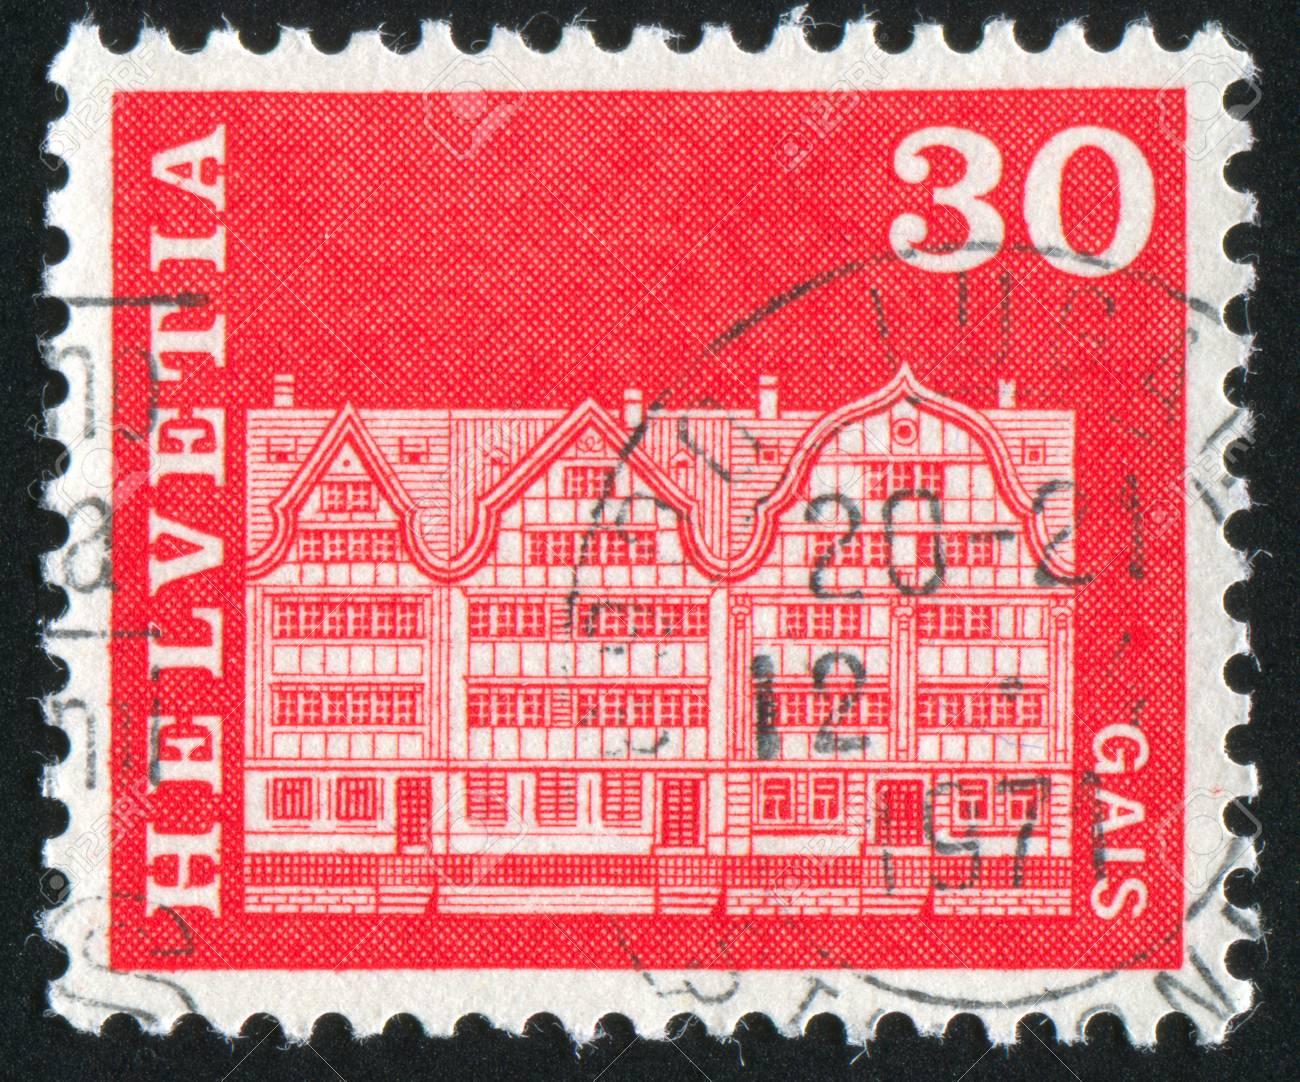 SWITZERLAND - CIRCA 1968: stamp printed by Switzerland, shows Gabled houses, Gais, circa 1968 Stock Photo - 12395141